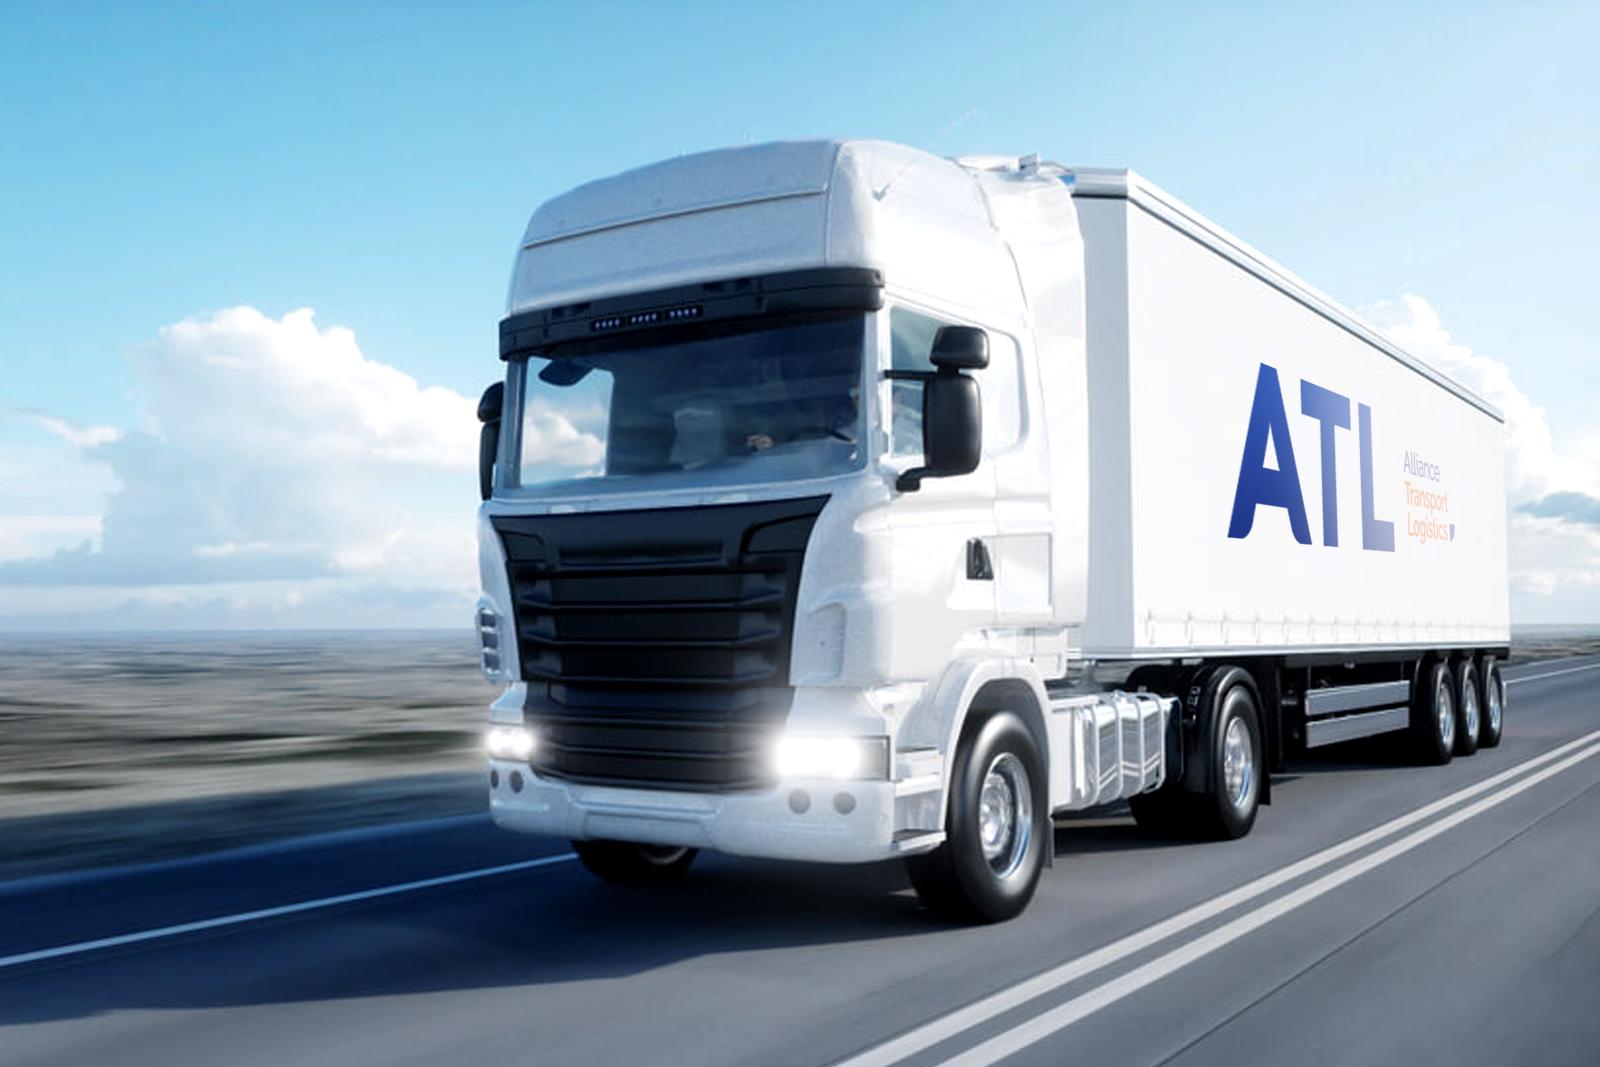 ATL Transporte